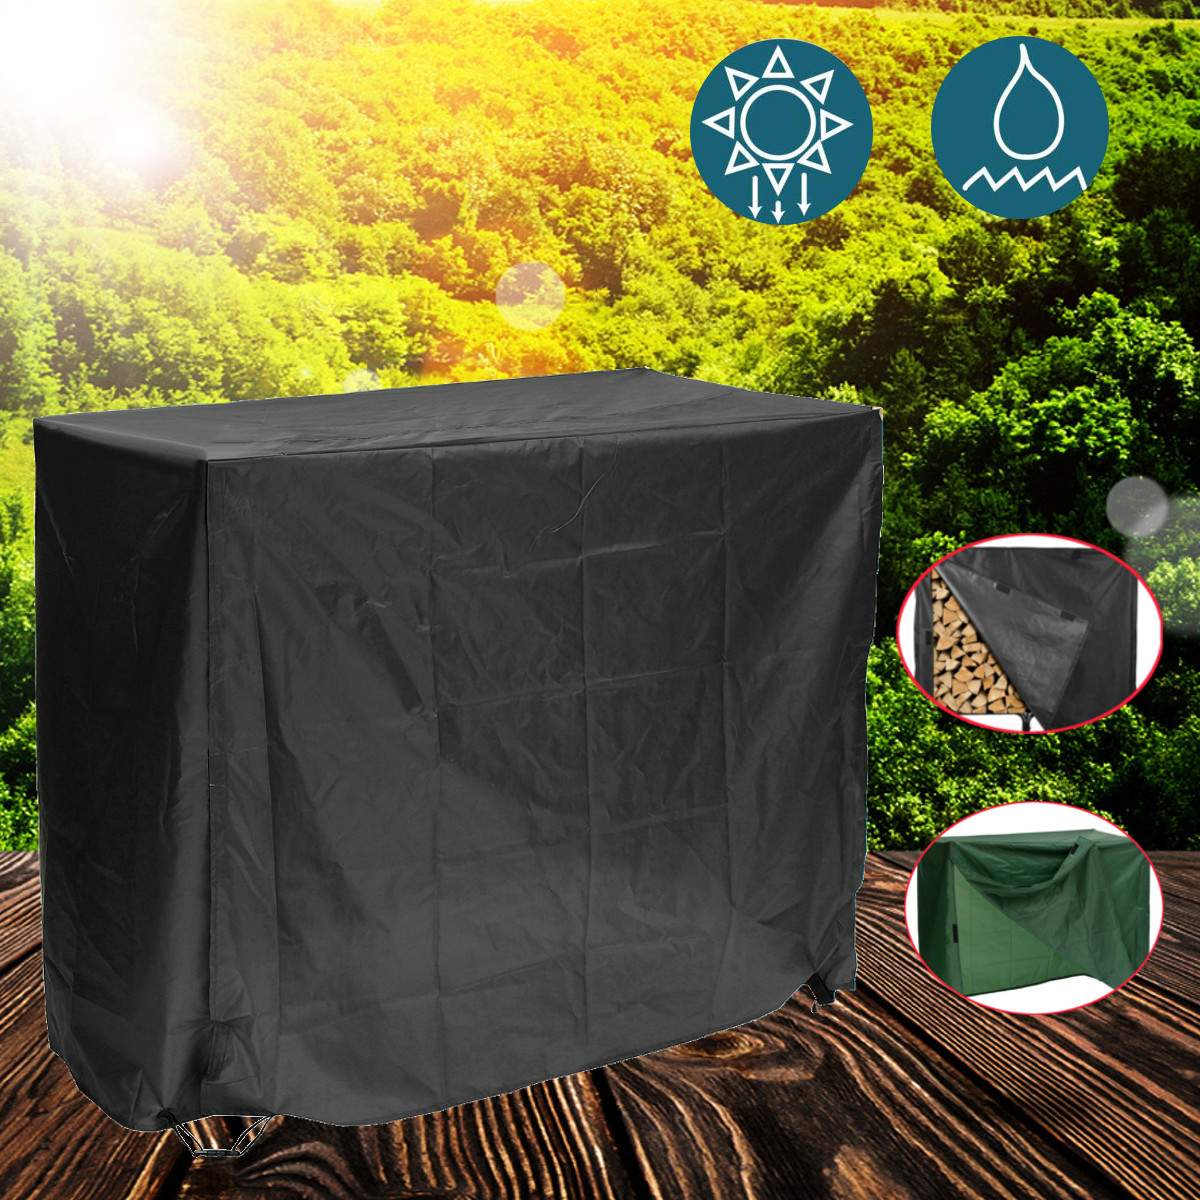 Proof Cover Garden Furniture Covers Waterproof Patio Swing Dustproof For Outdoors Garden Protective Case